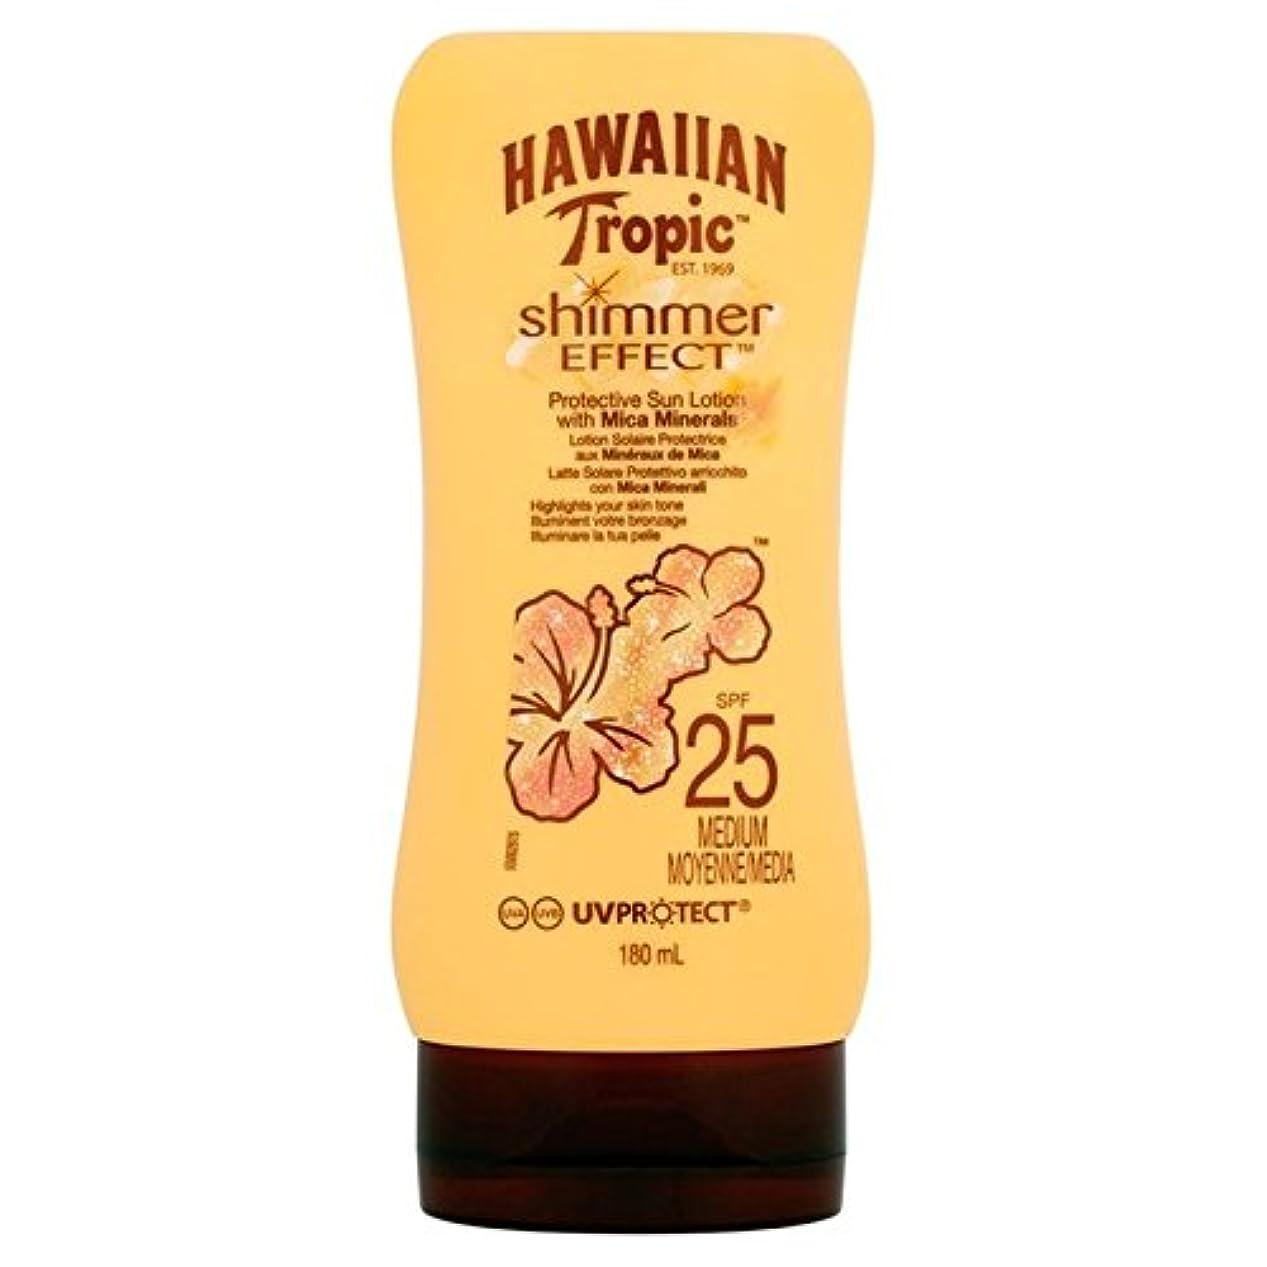 Hawaiian Tropic Silk Shimmer Effect Sun Cream SPF 25 180ml - 南国ハワイシルクきらめき効果の日焼け止めクリーム 25 180ミリリットル [並行輸入品]